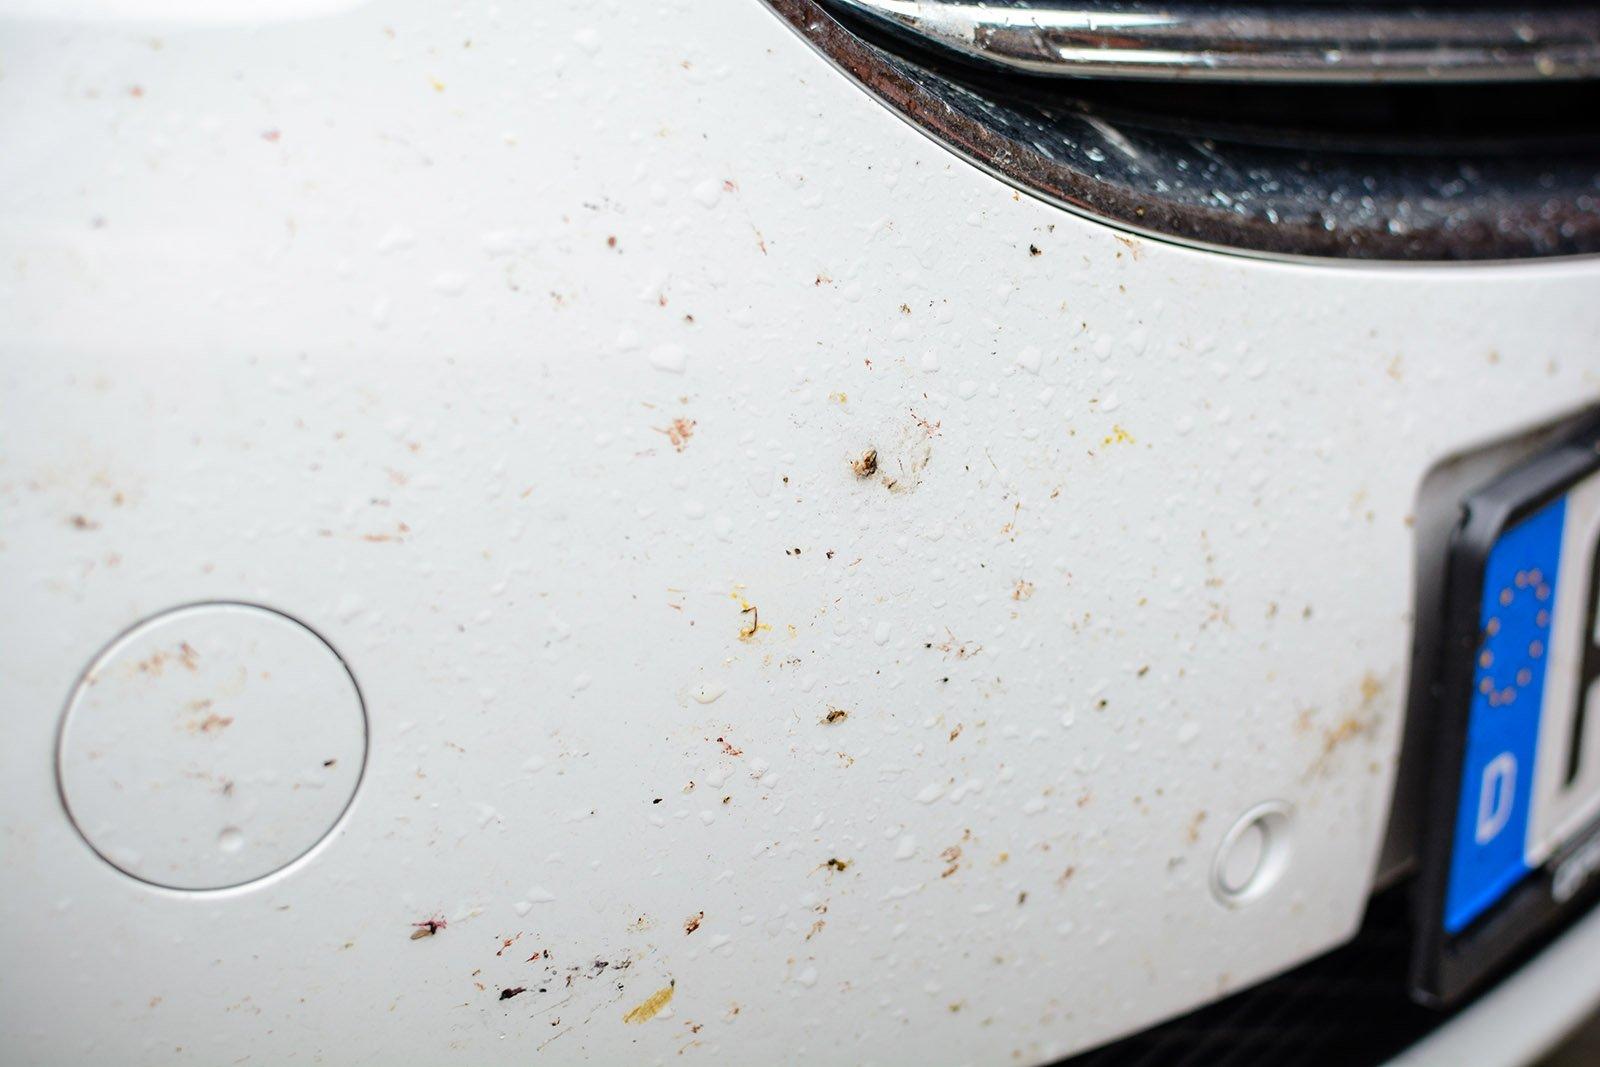 bugs splattered on a car's front bumper